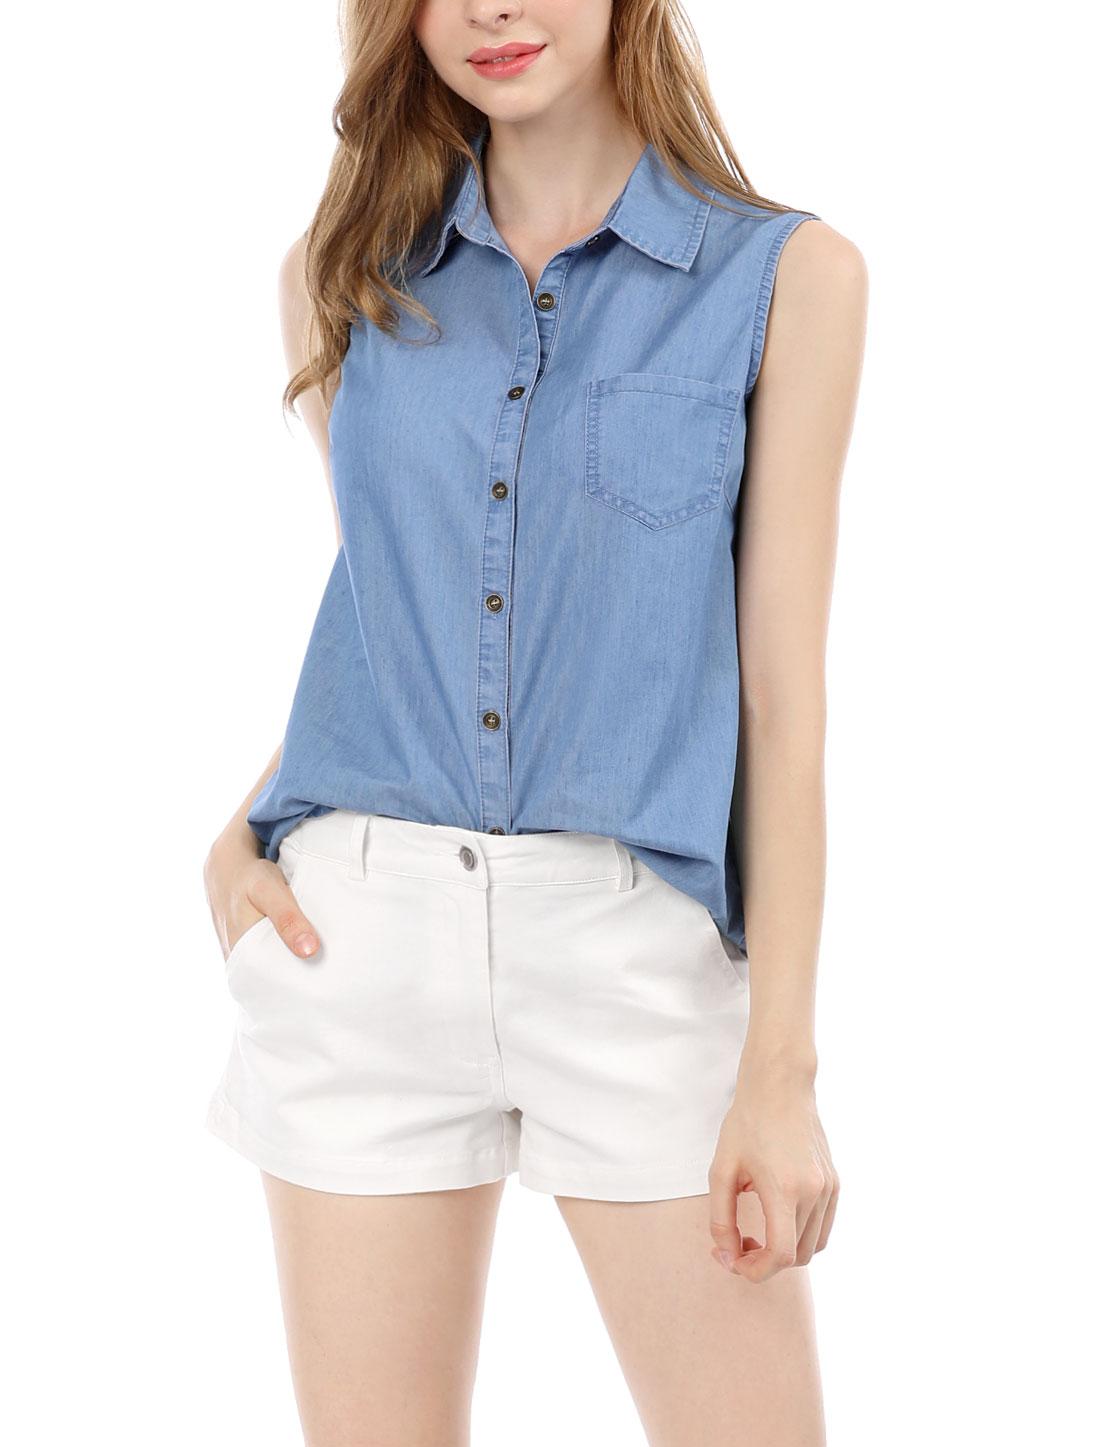 Allegra K Women Single Breasted Collar Sleeveless Shirt Blue M